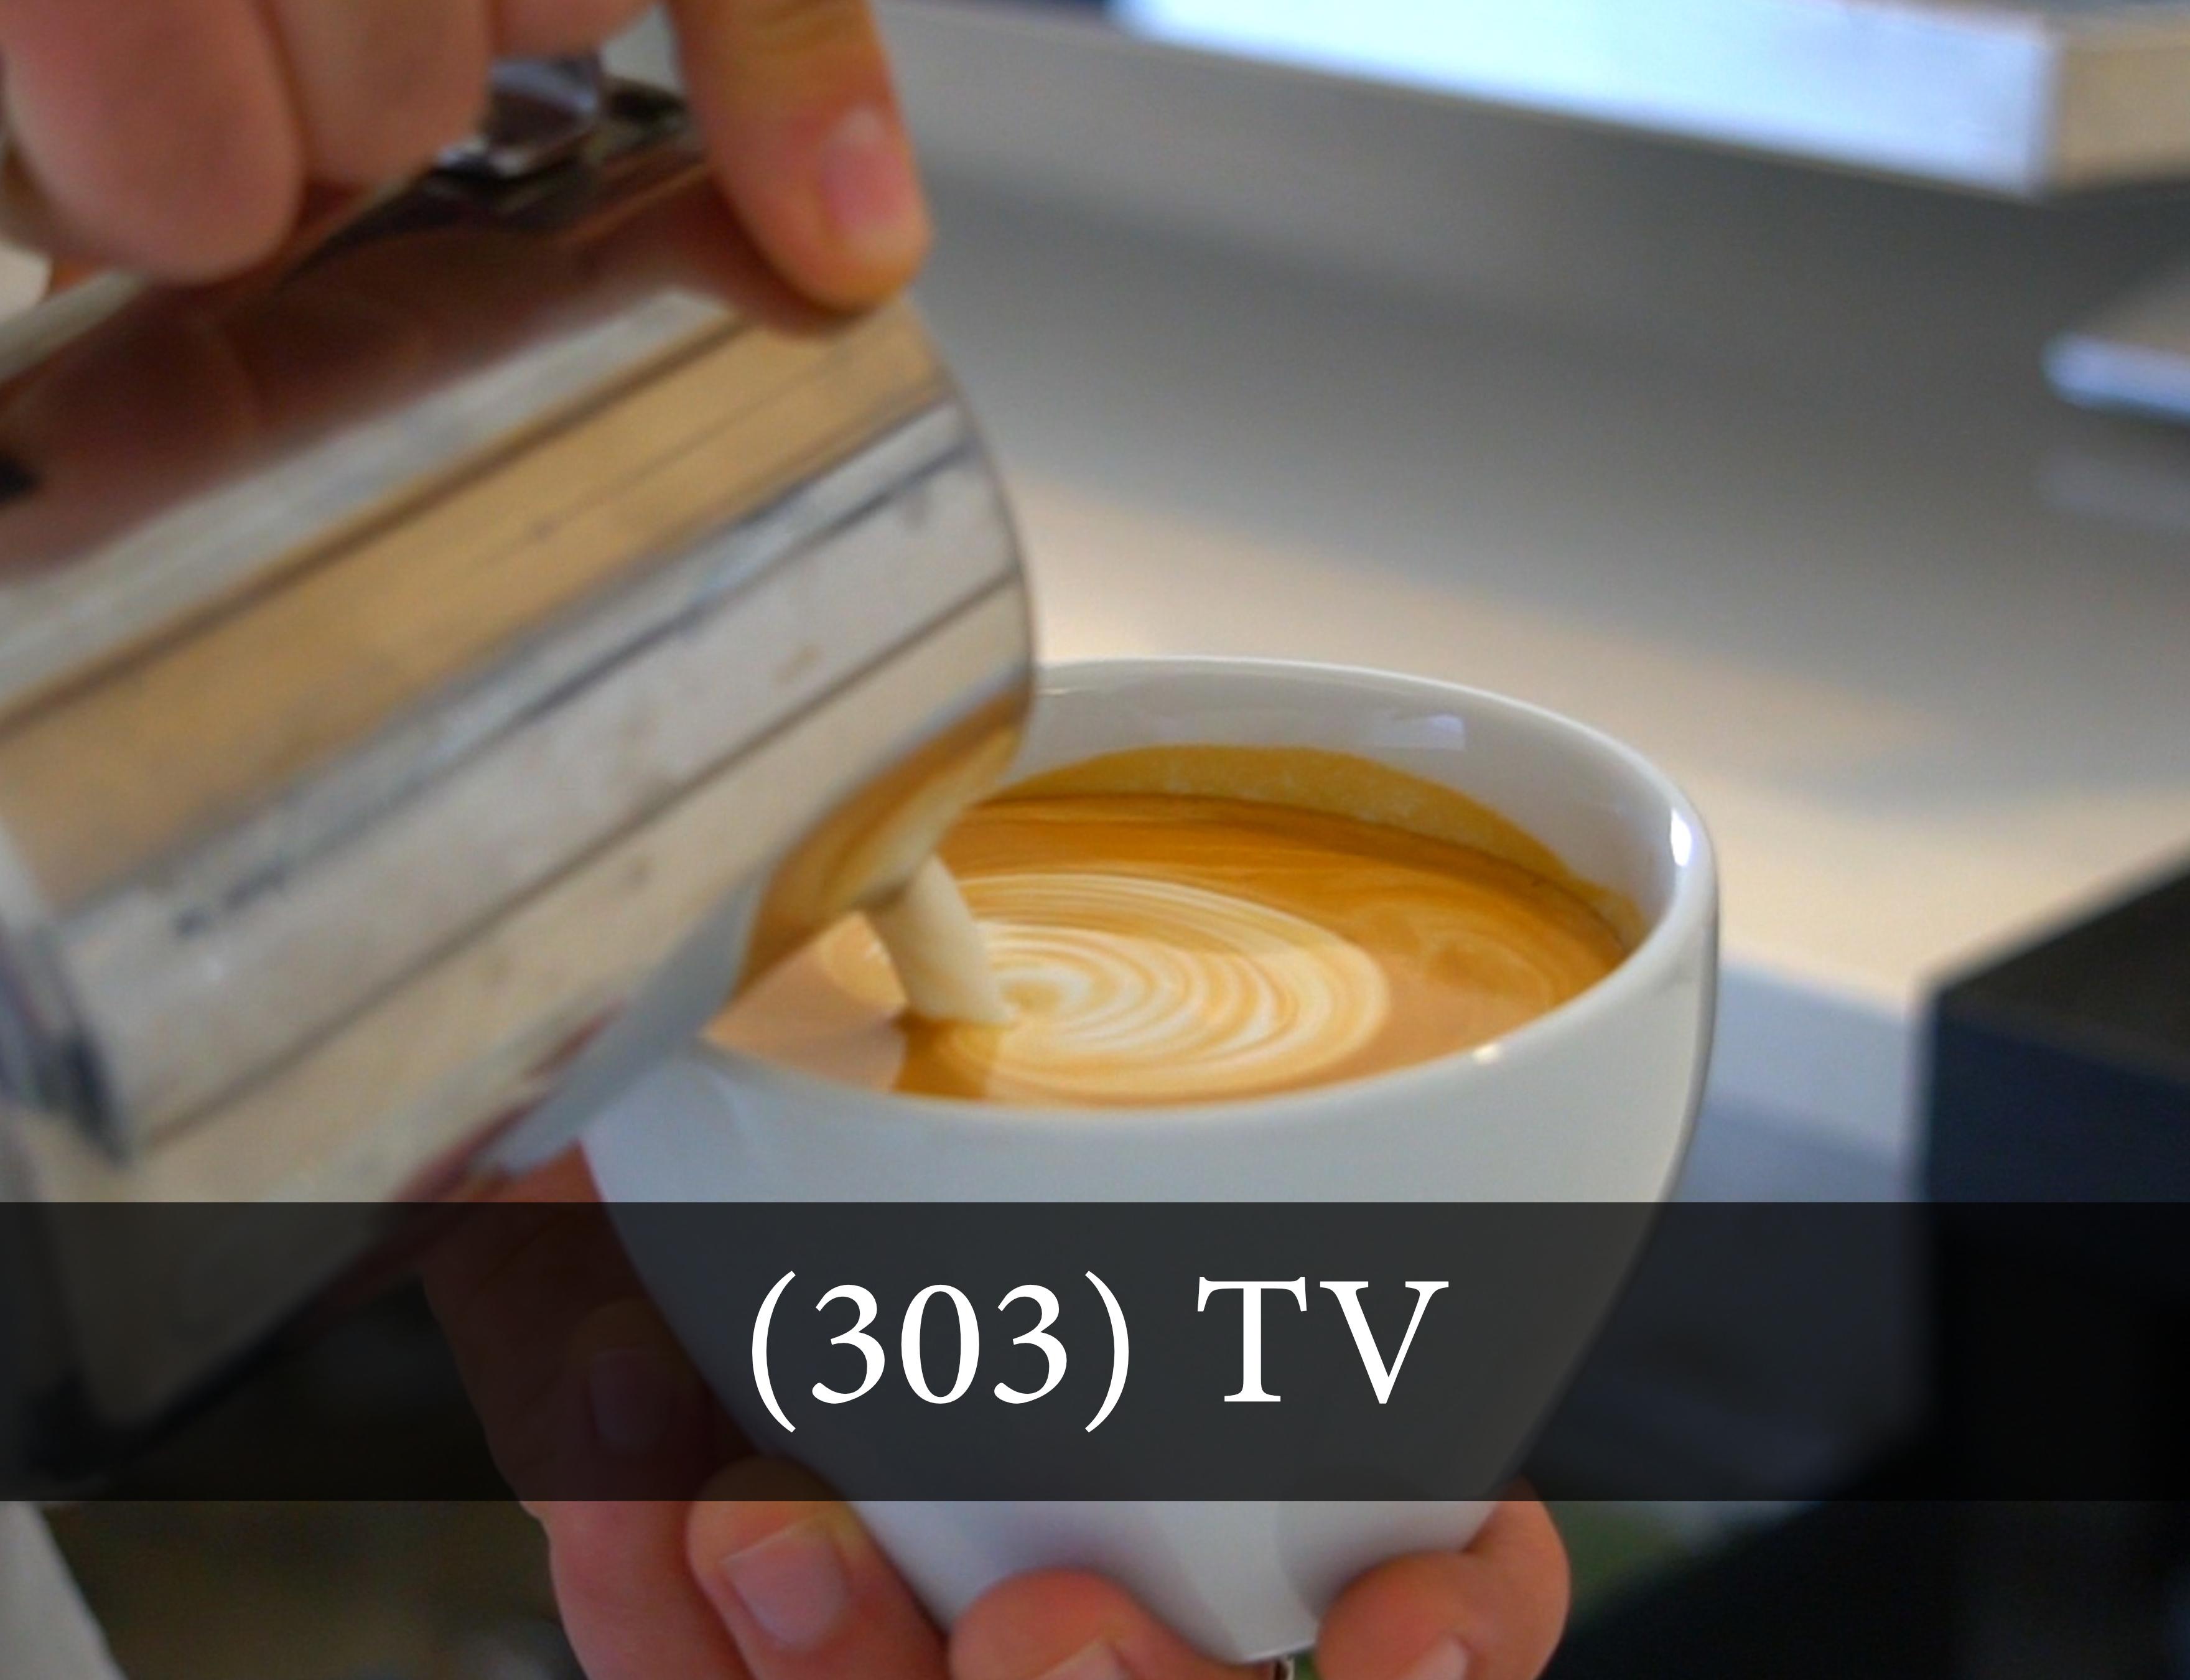 303 TV